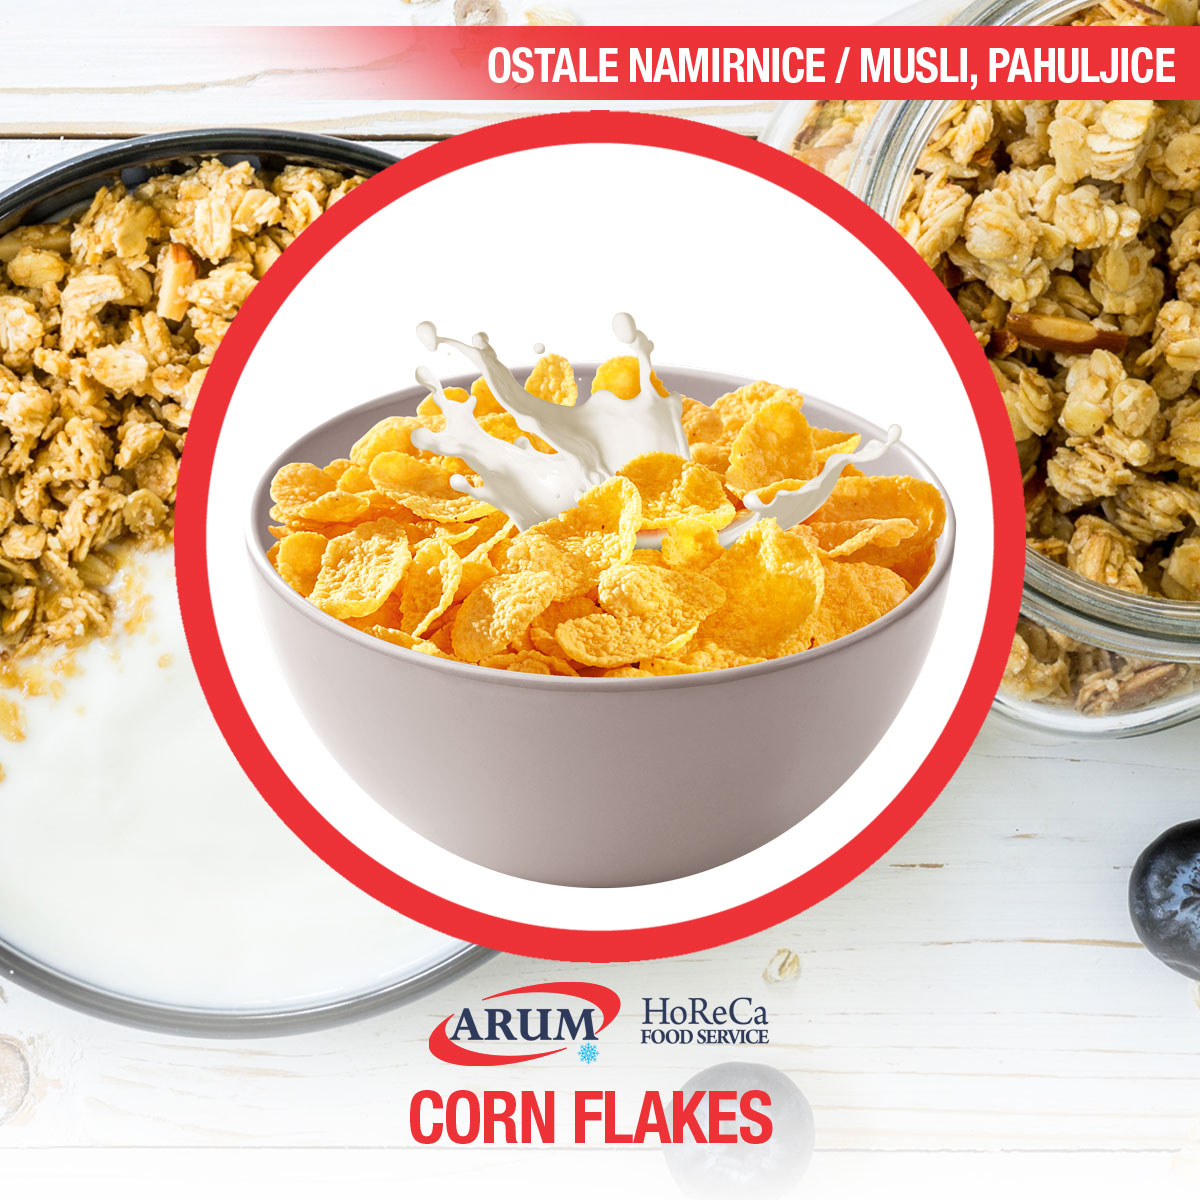 Corn flakes 0.5